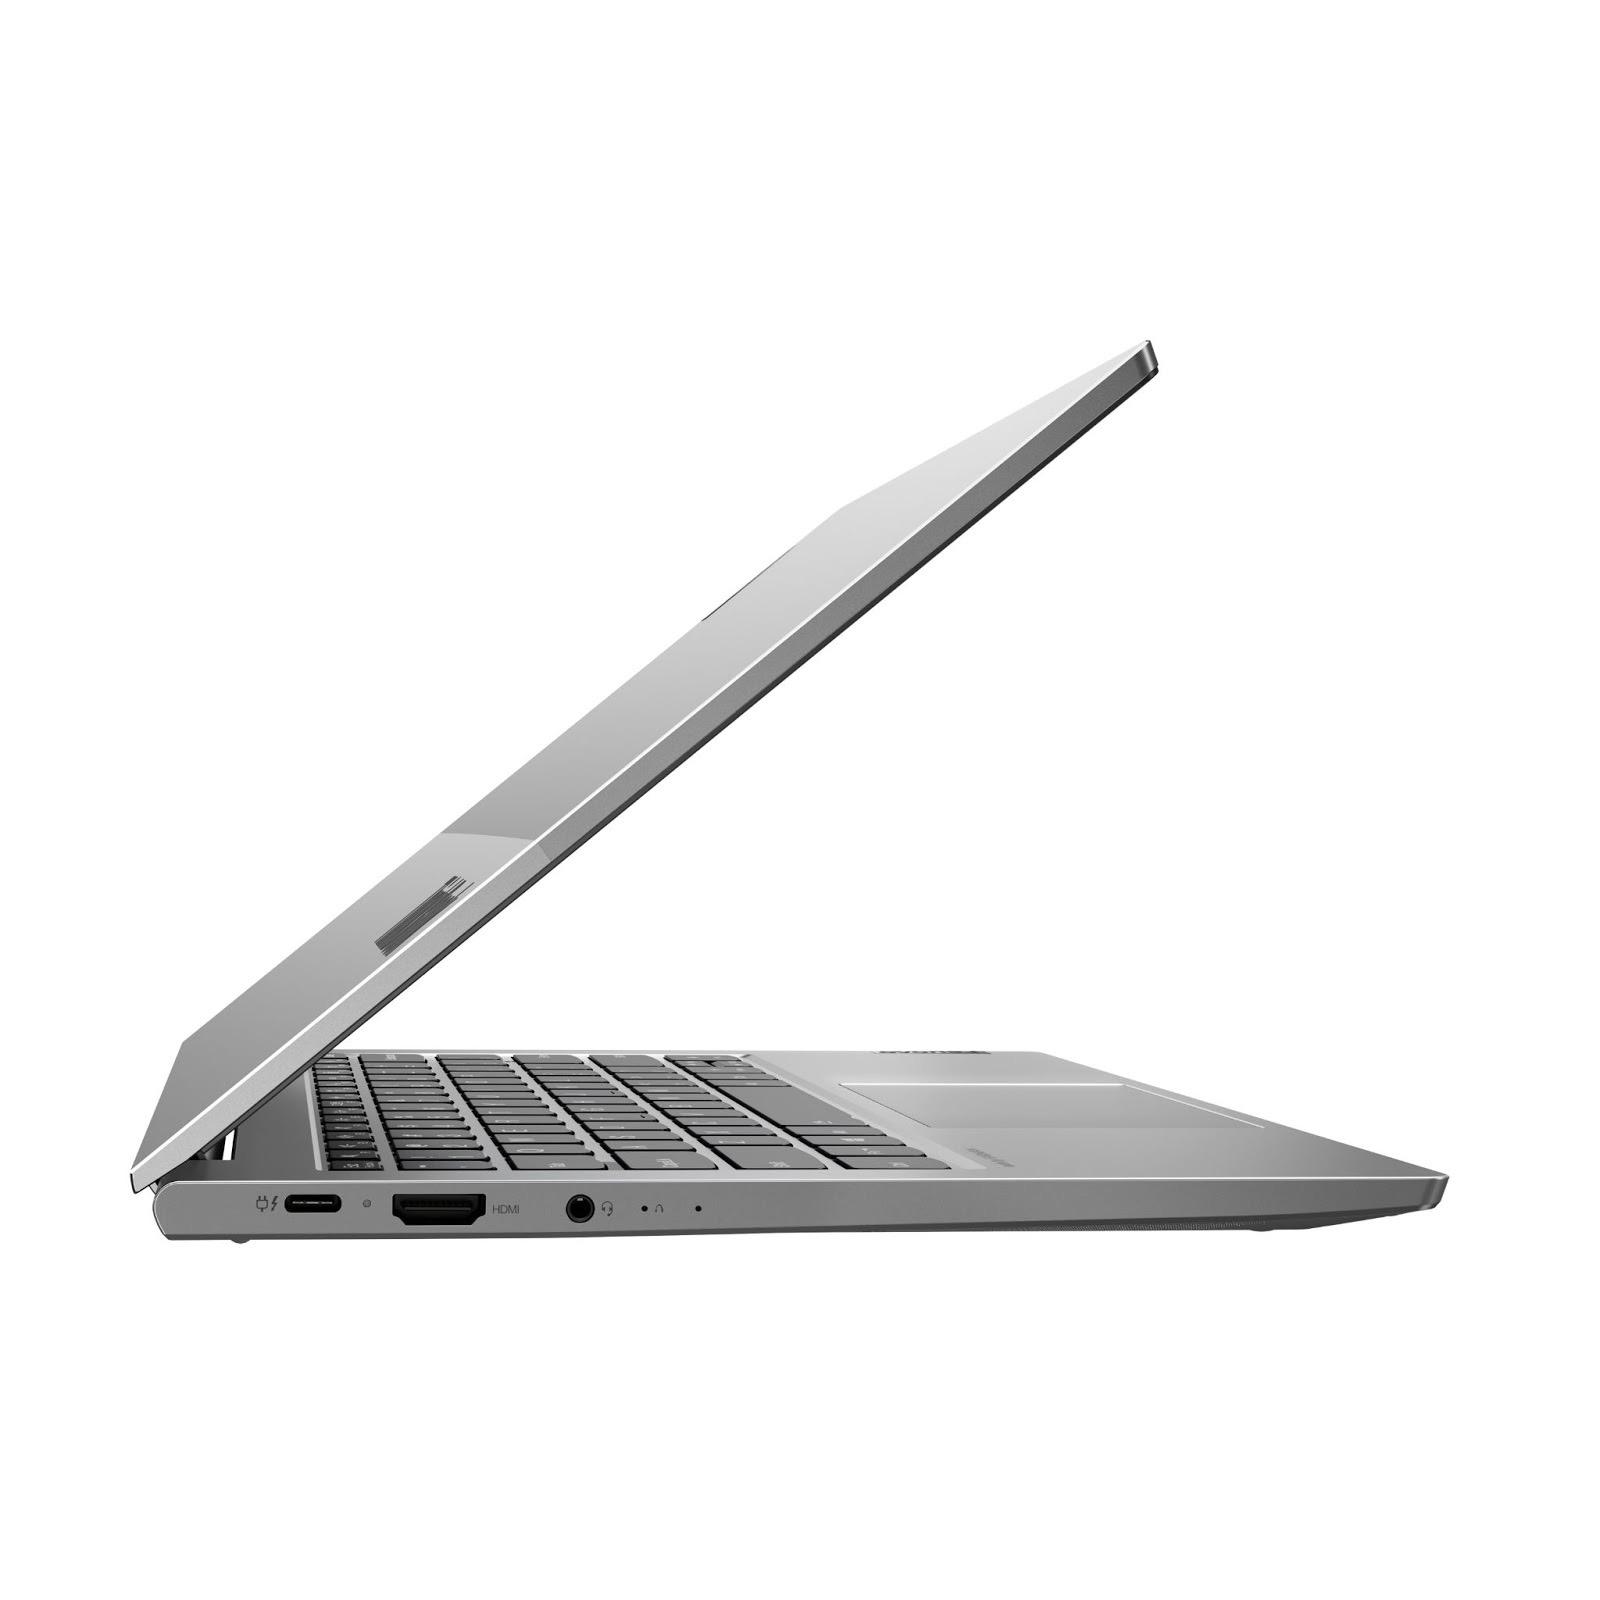 Фото 2. Ноутбук Lenovo ThinkBook 13s Gen 2 ITL (20V9003TRU)